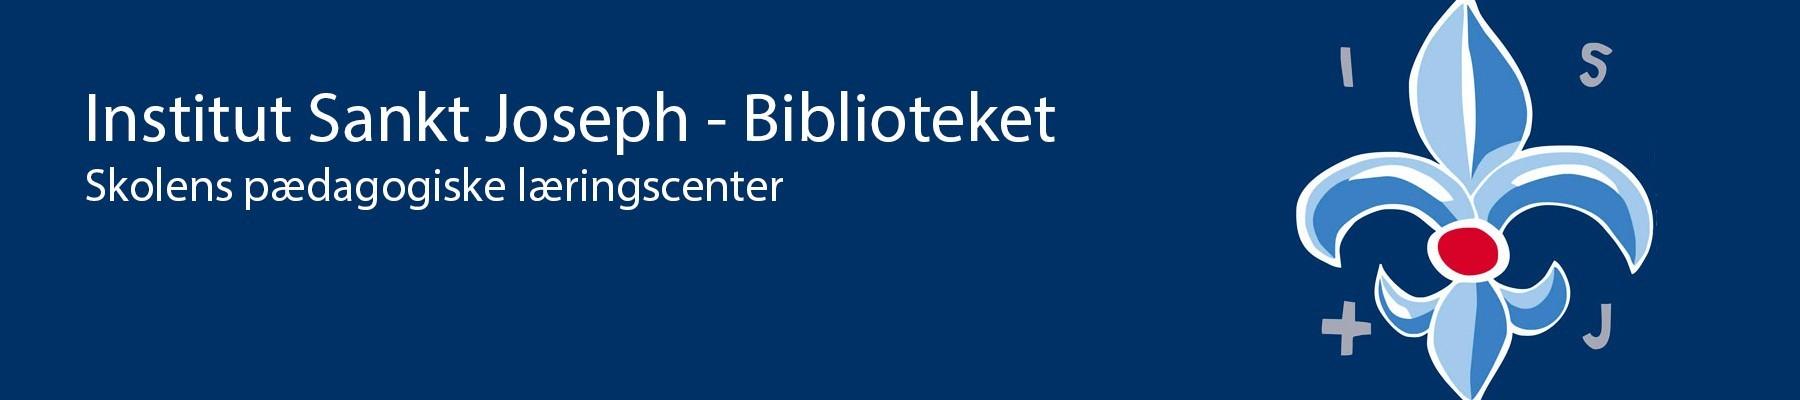 Institut Sankt Joseph – Bibliotek og mediecenter